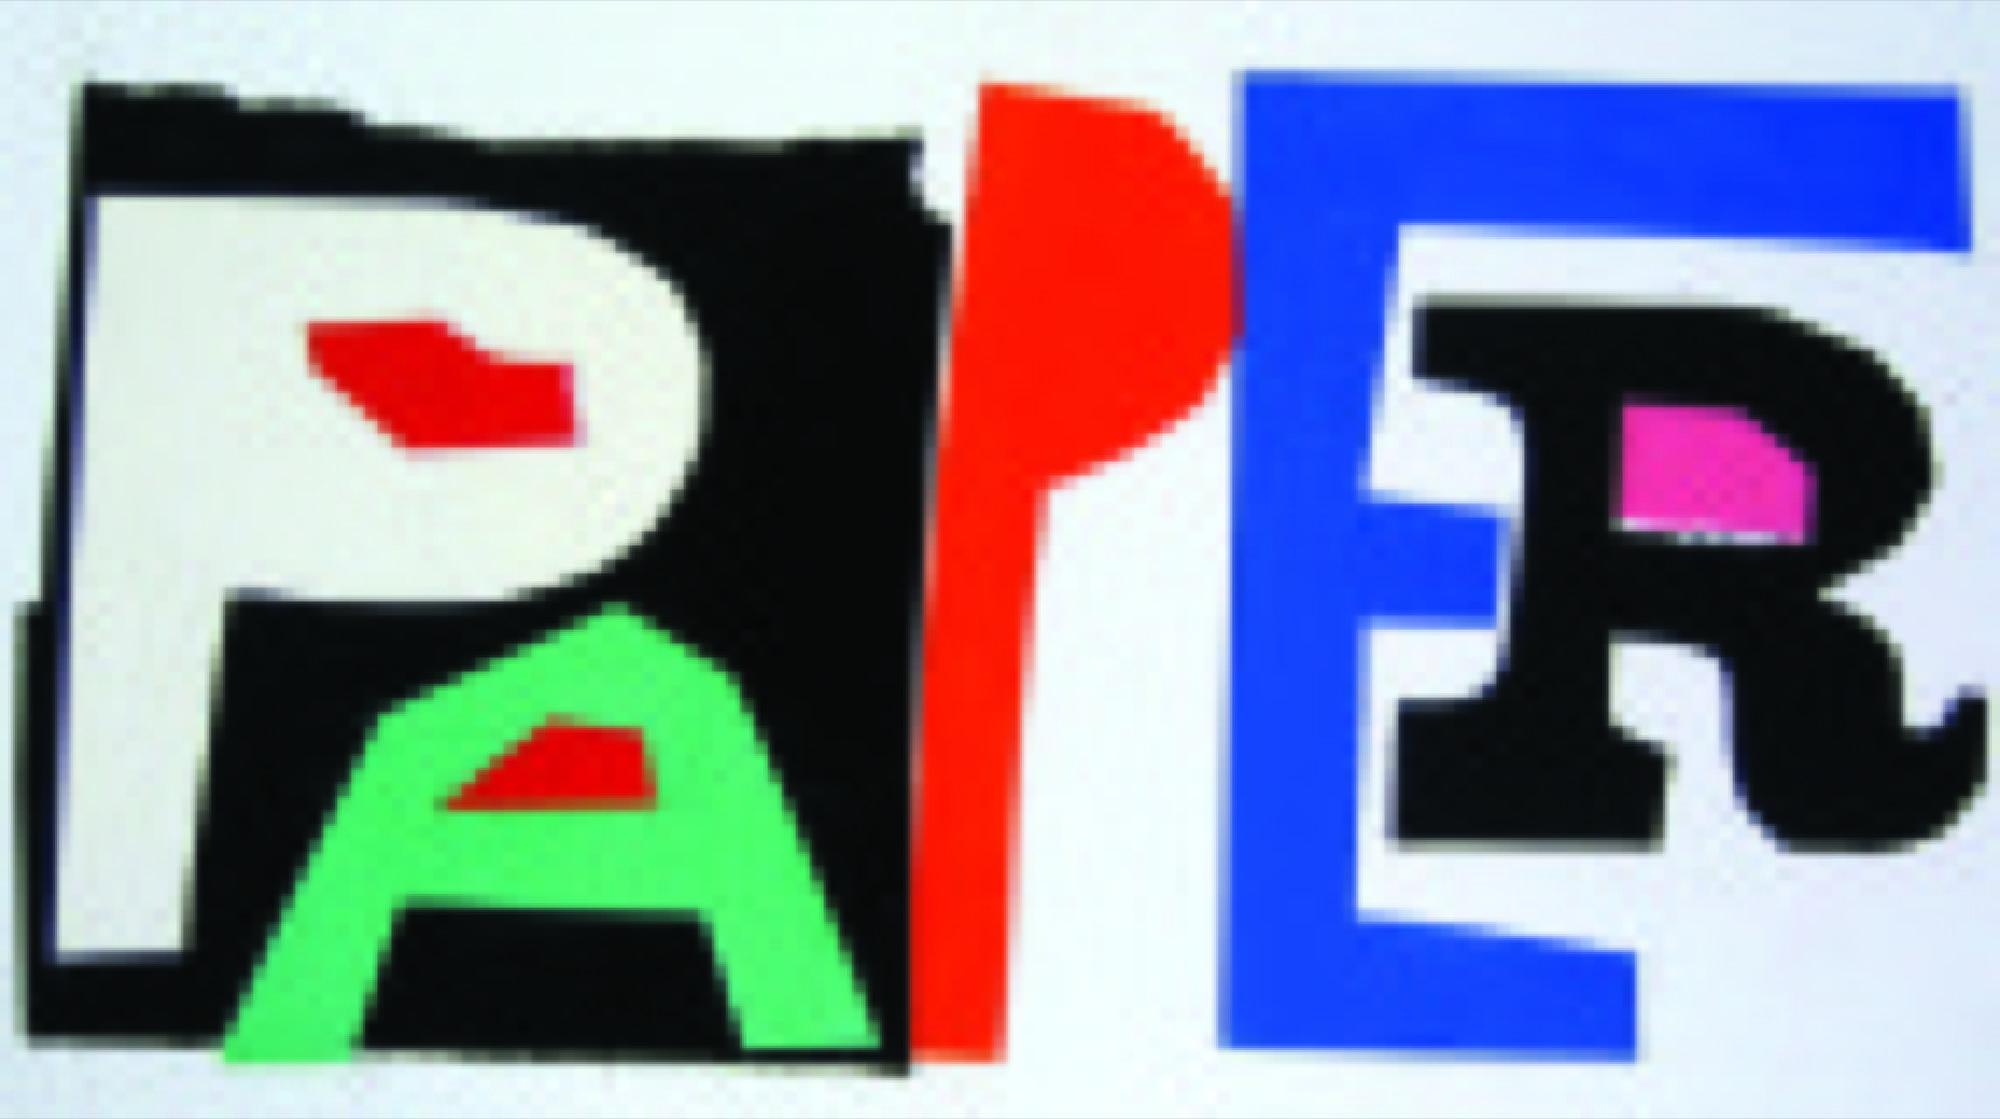 PAPER Magazine Logotype